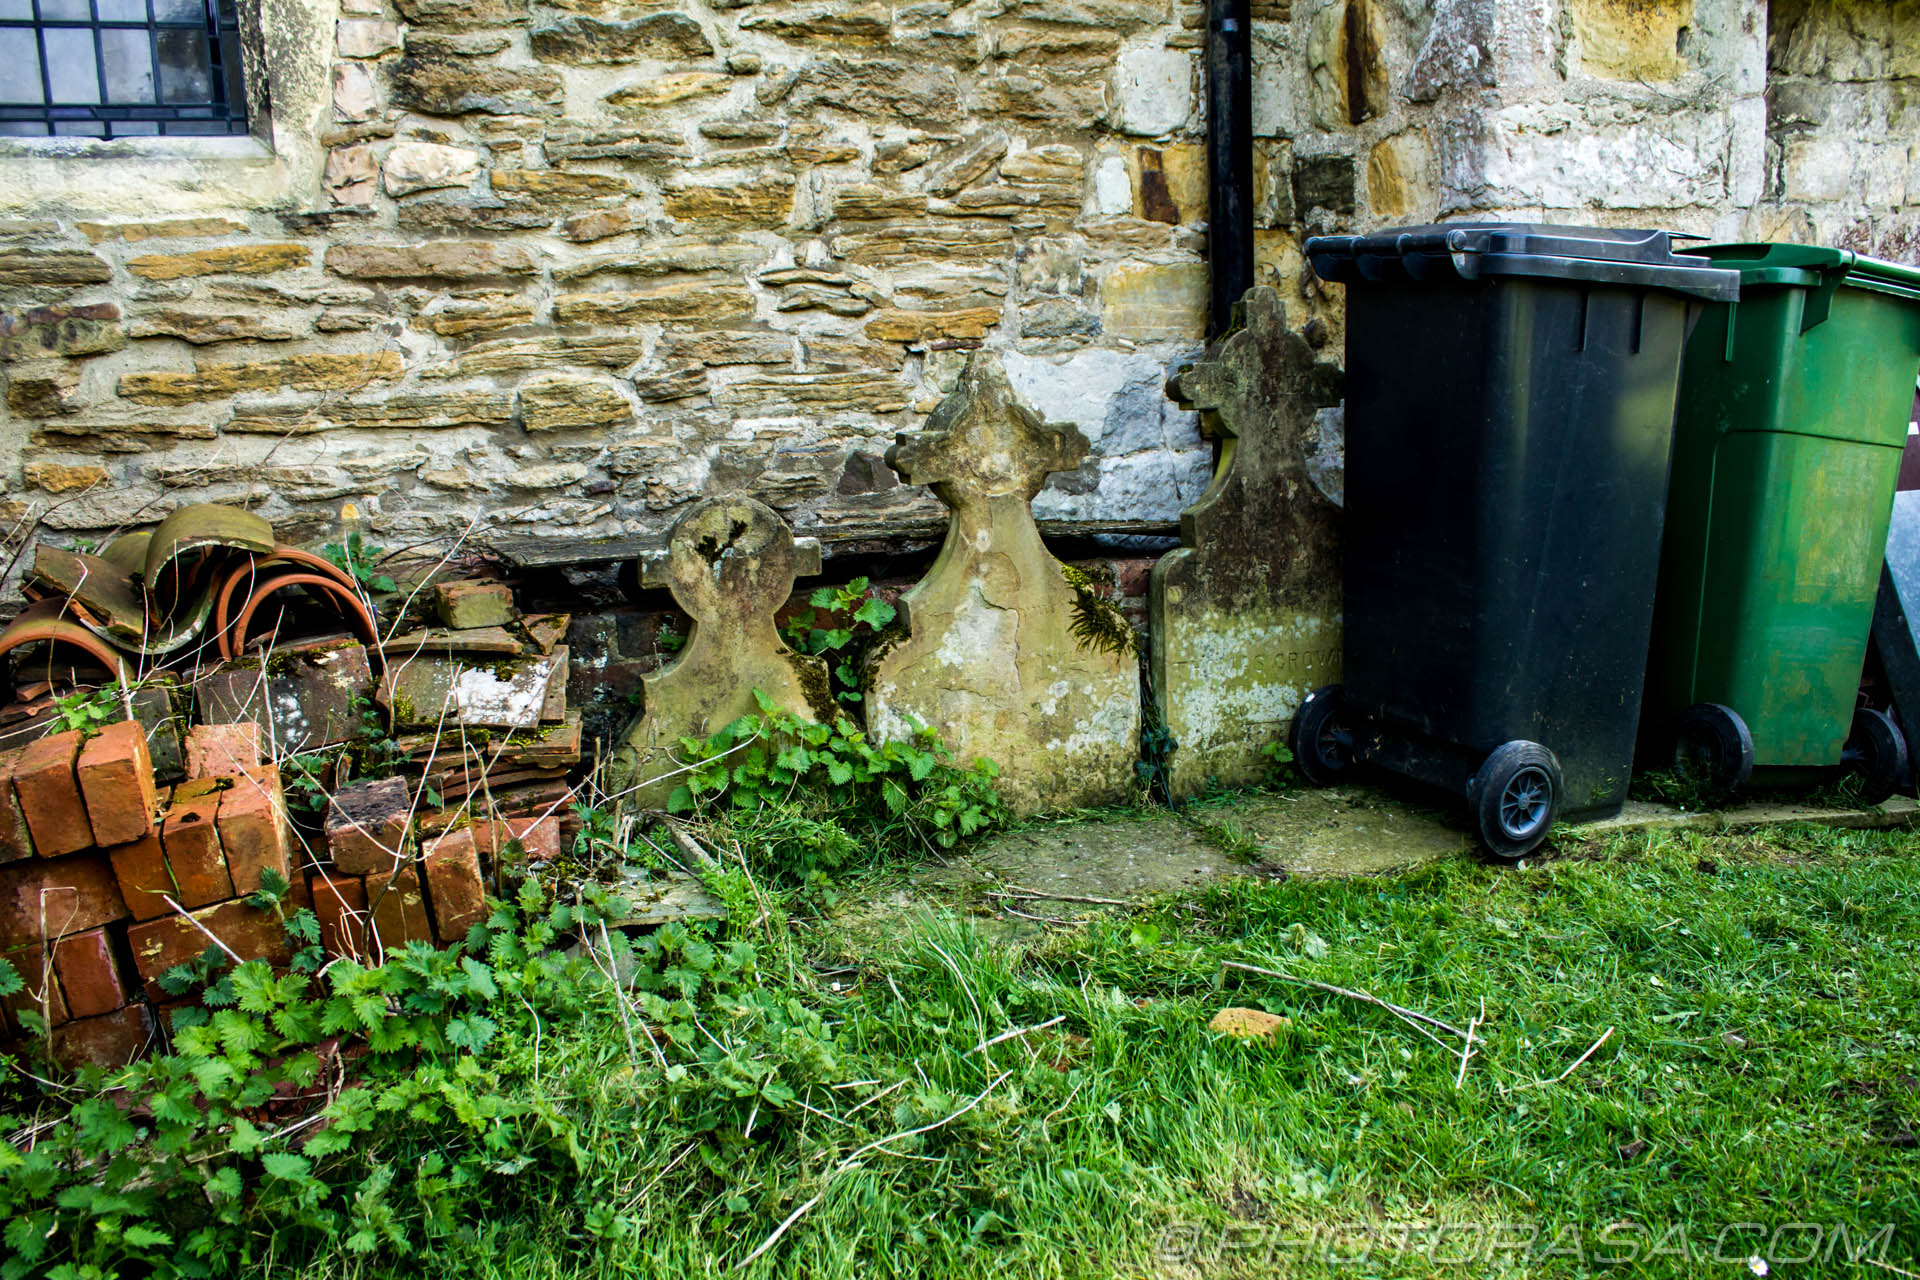 https://photorasa.com/saints-church-staplehurst-kent/graves-and-rubbish-bins/